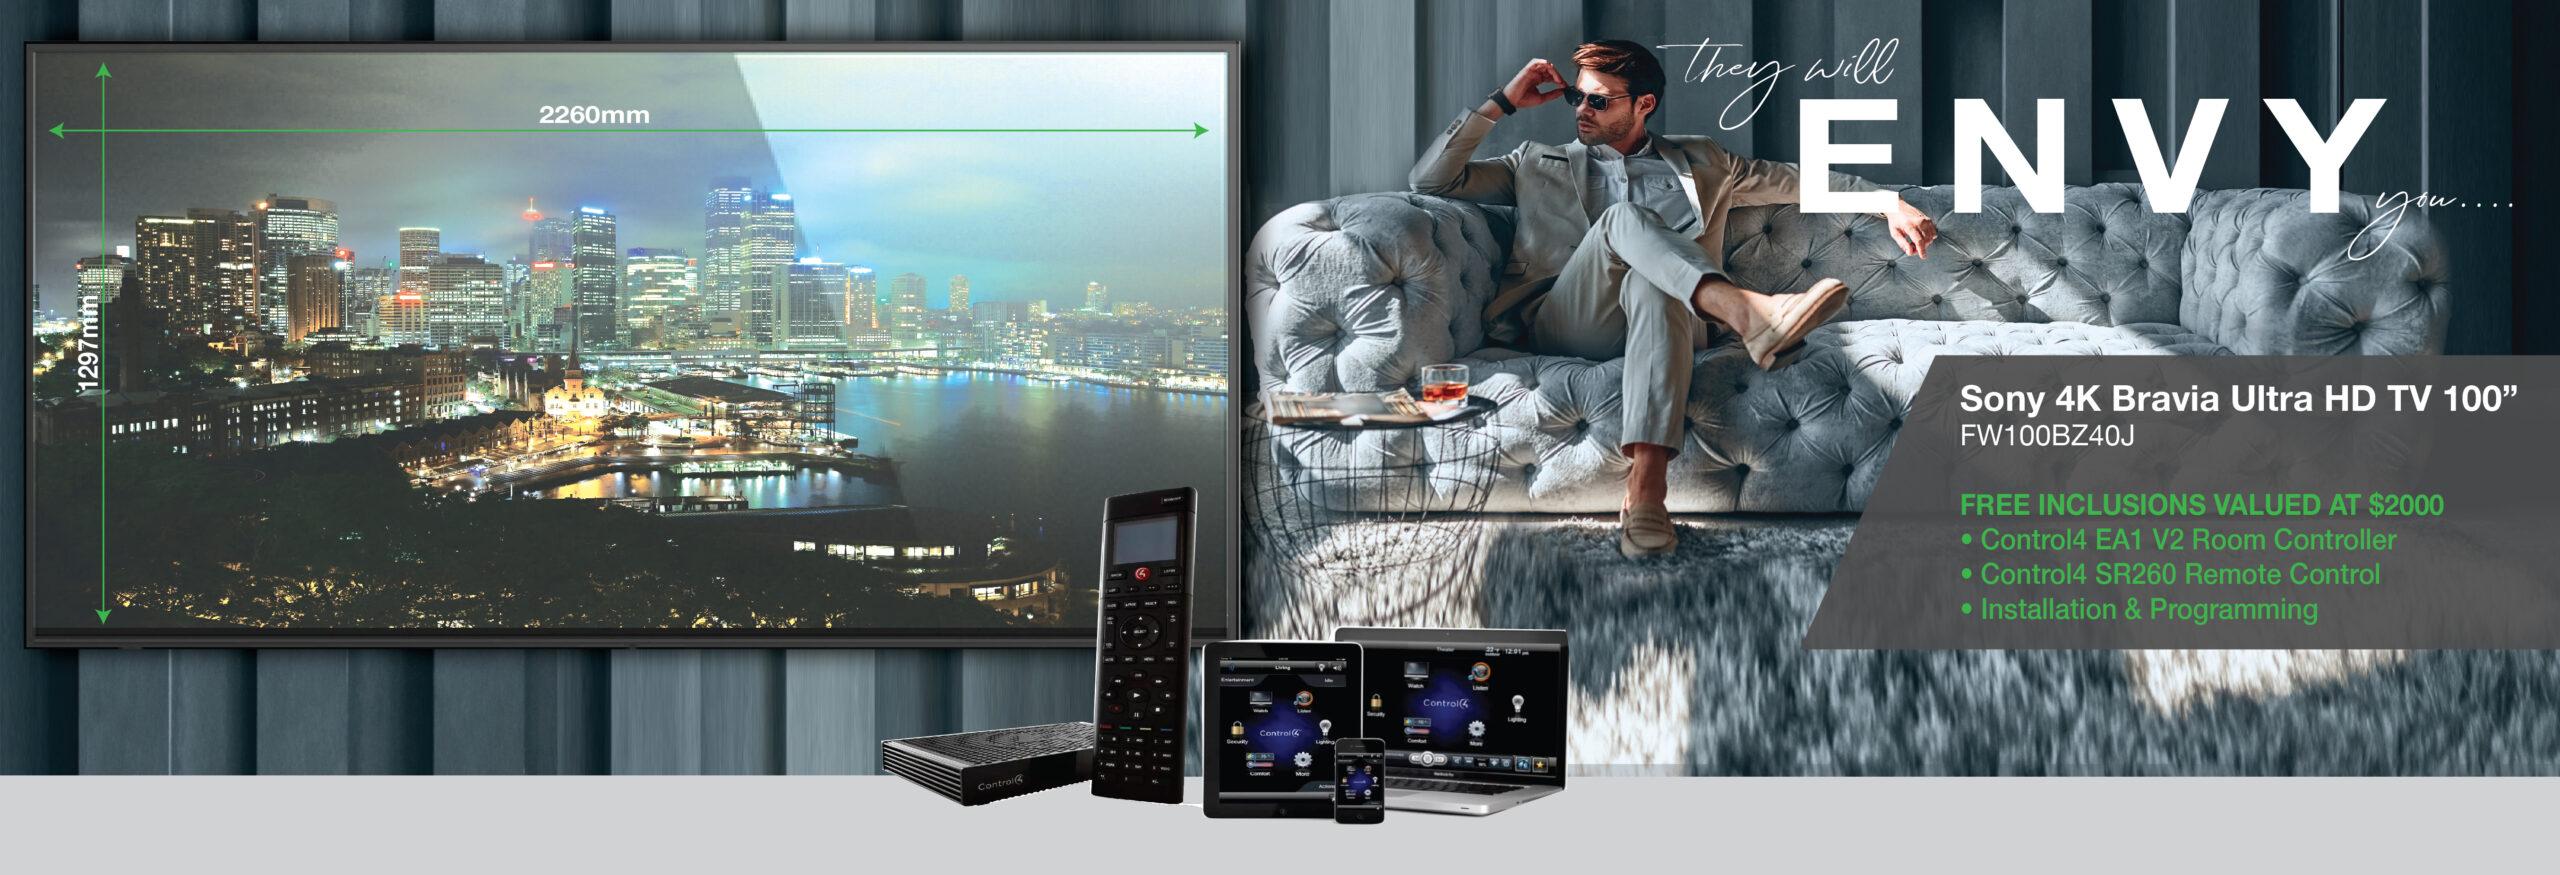 300dpi Sony Bravia Tv Promo Web Banner 1300px X444 Px